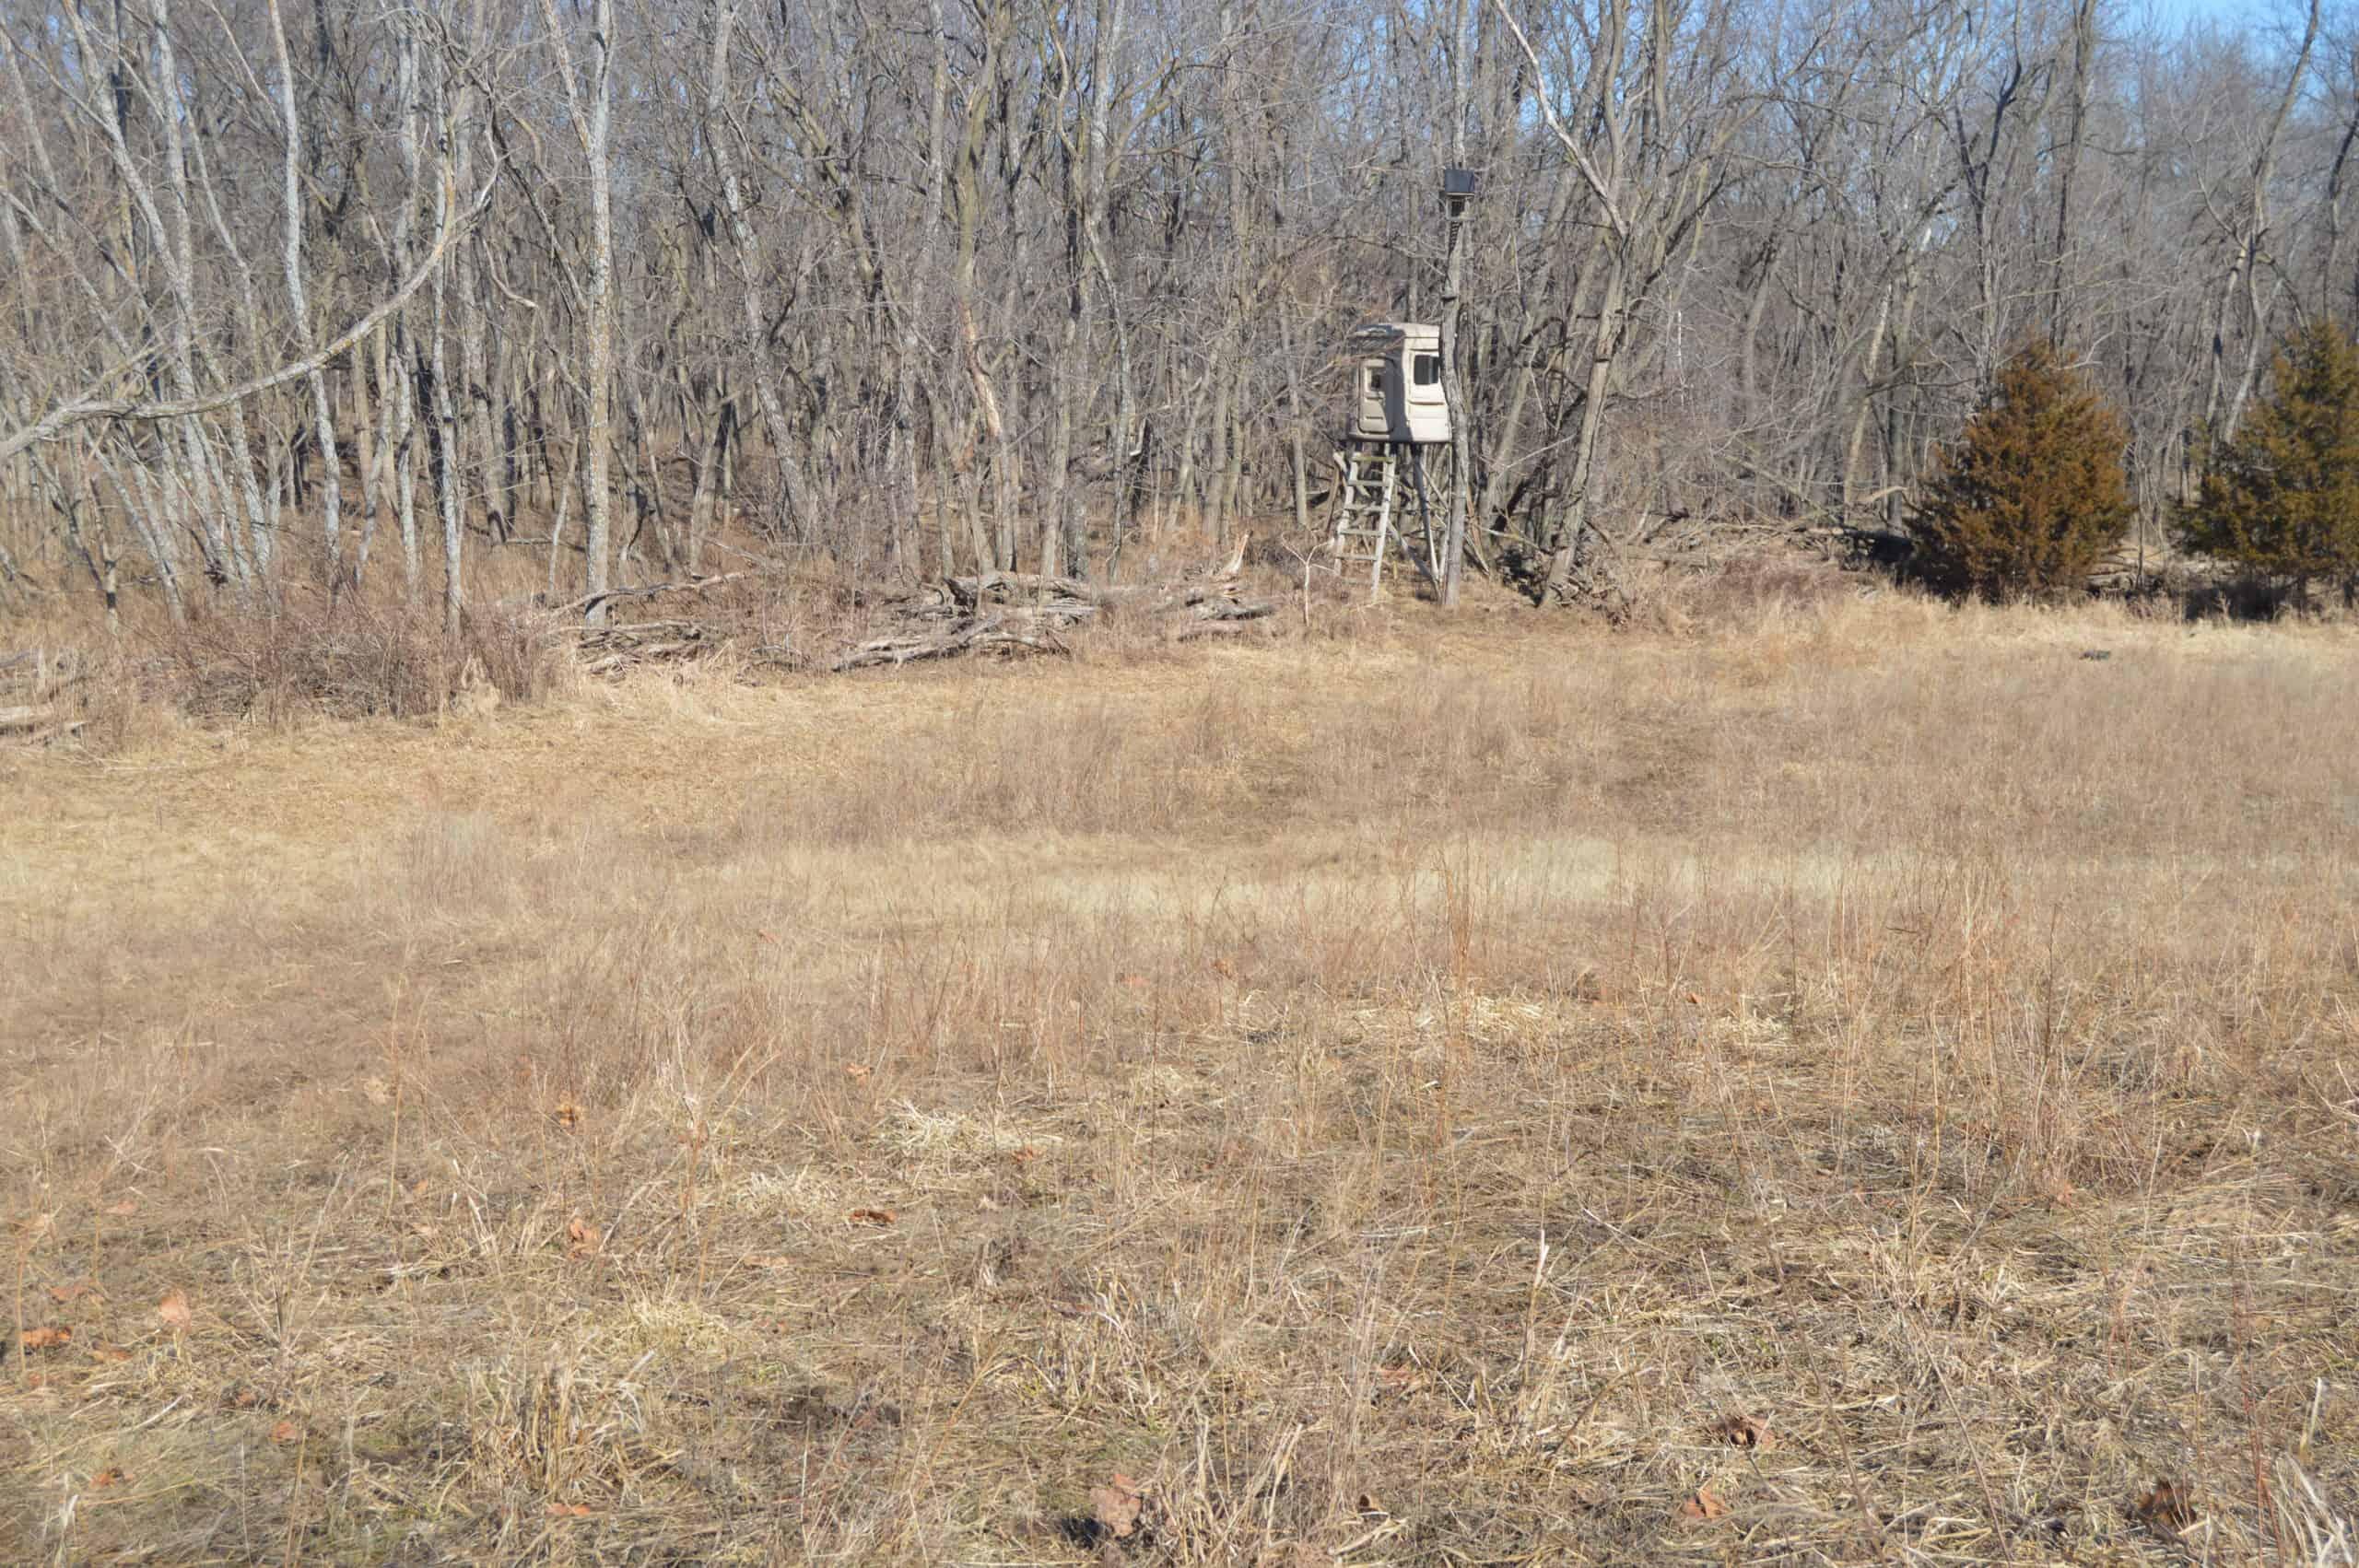 80 Acres High Fenced / Development Land